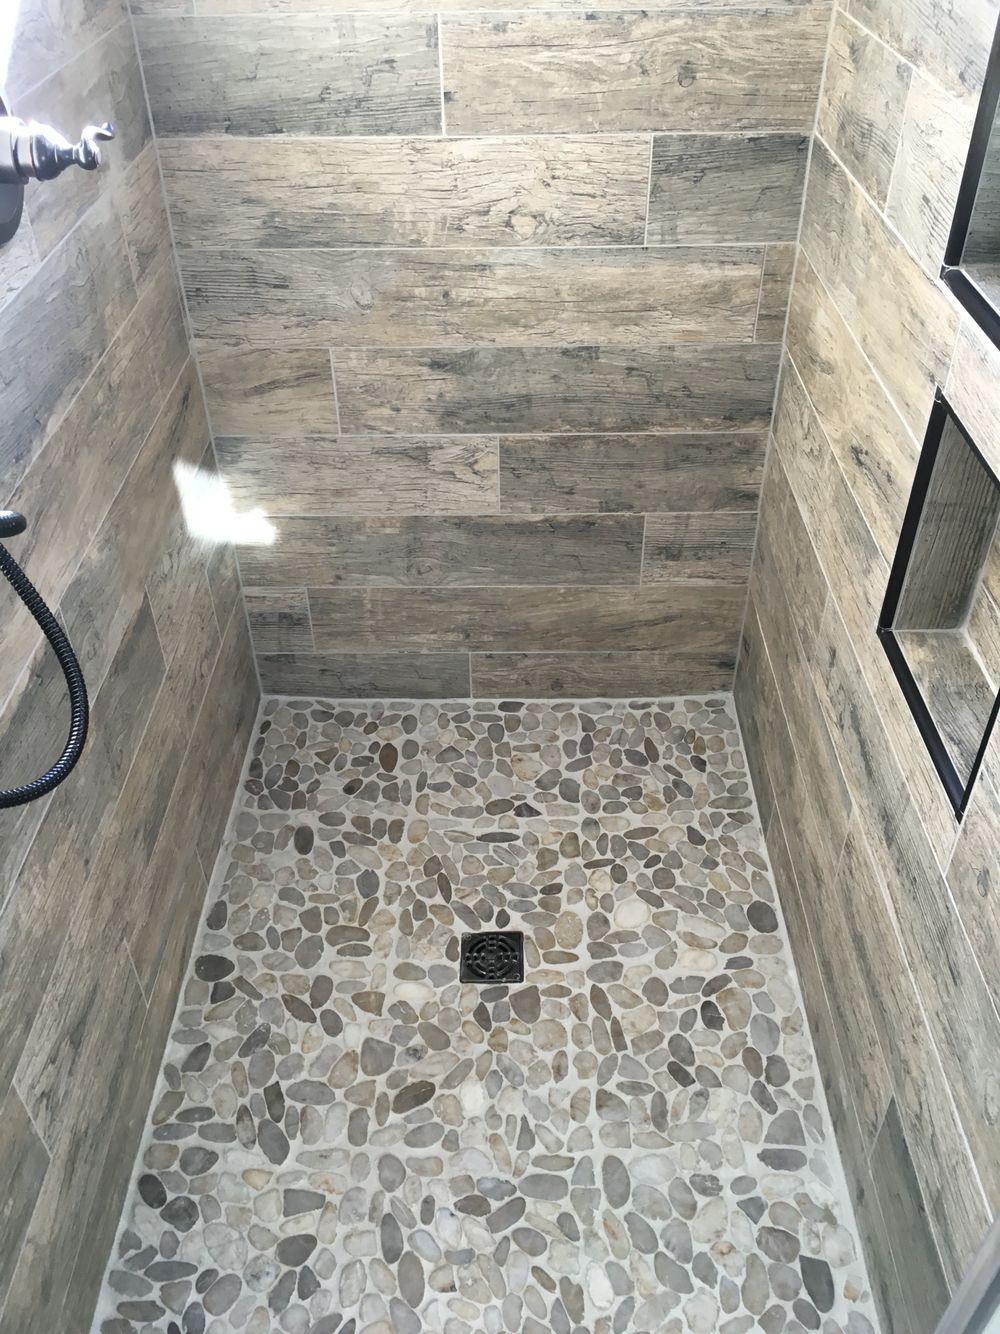 Discover ideas about Wood Look Tile ... - nl.pinterest.com